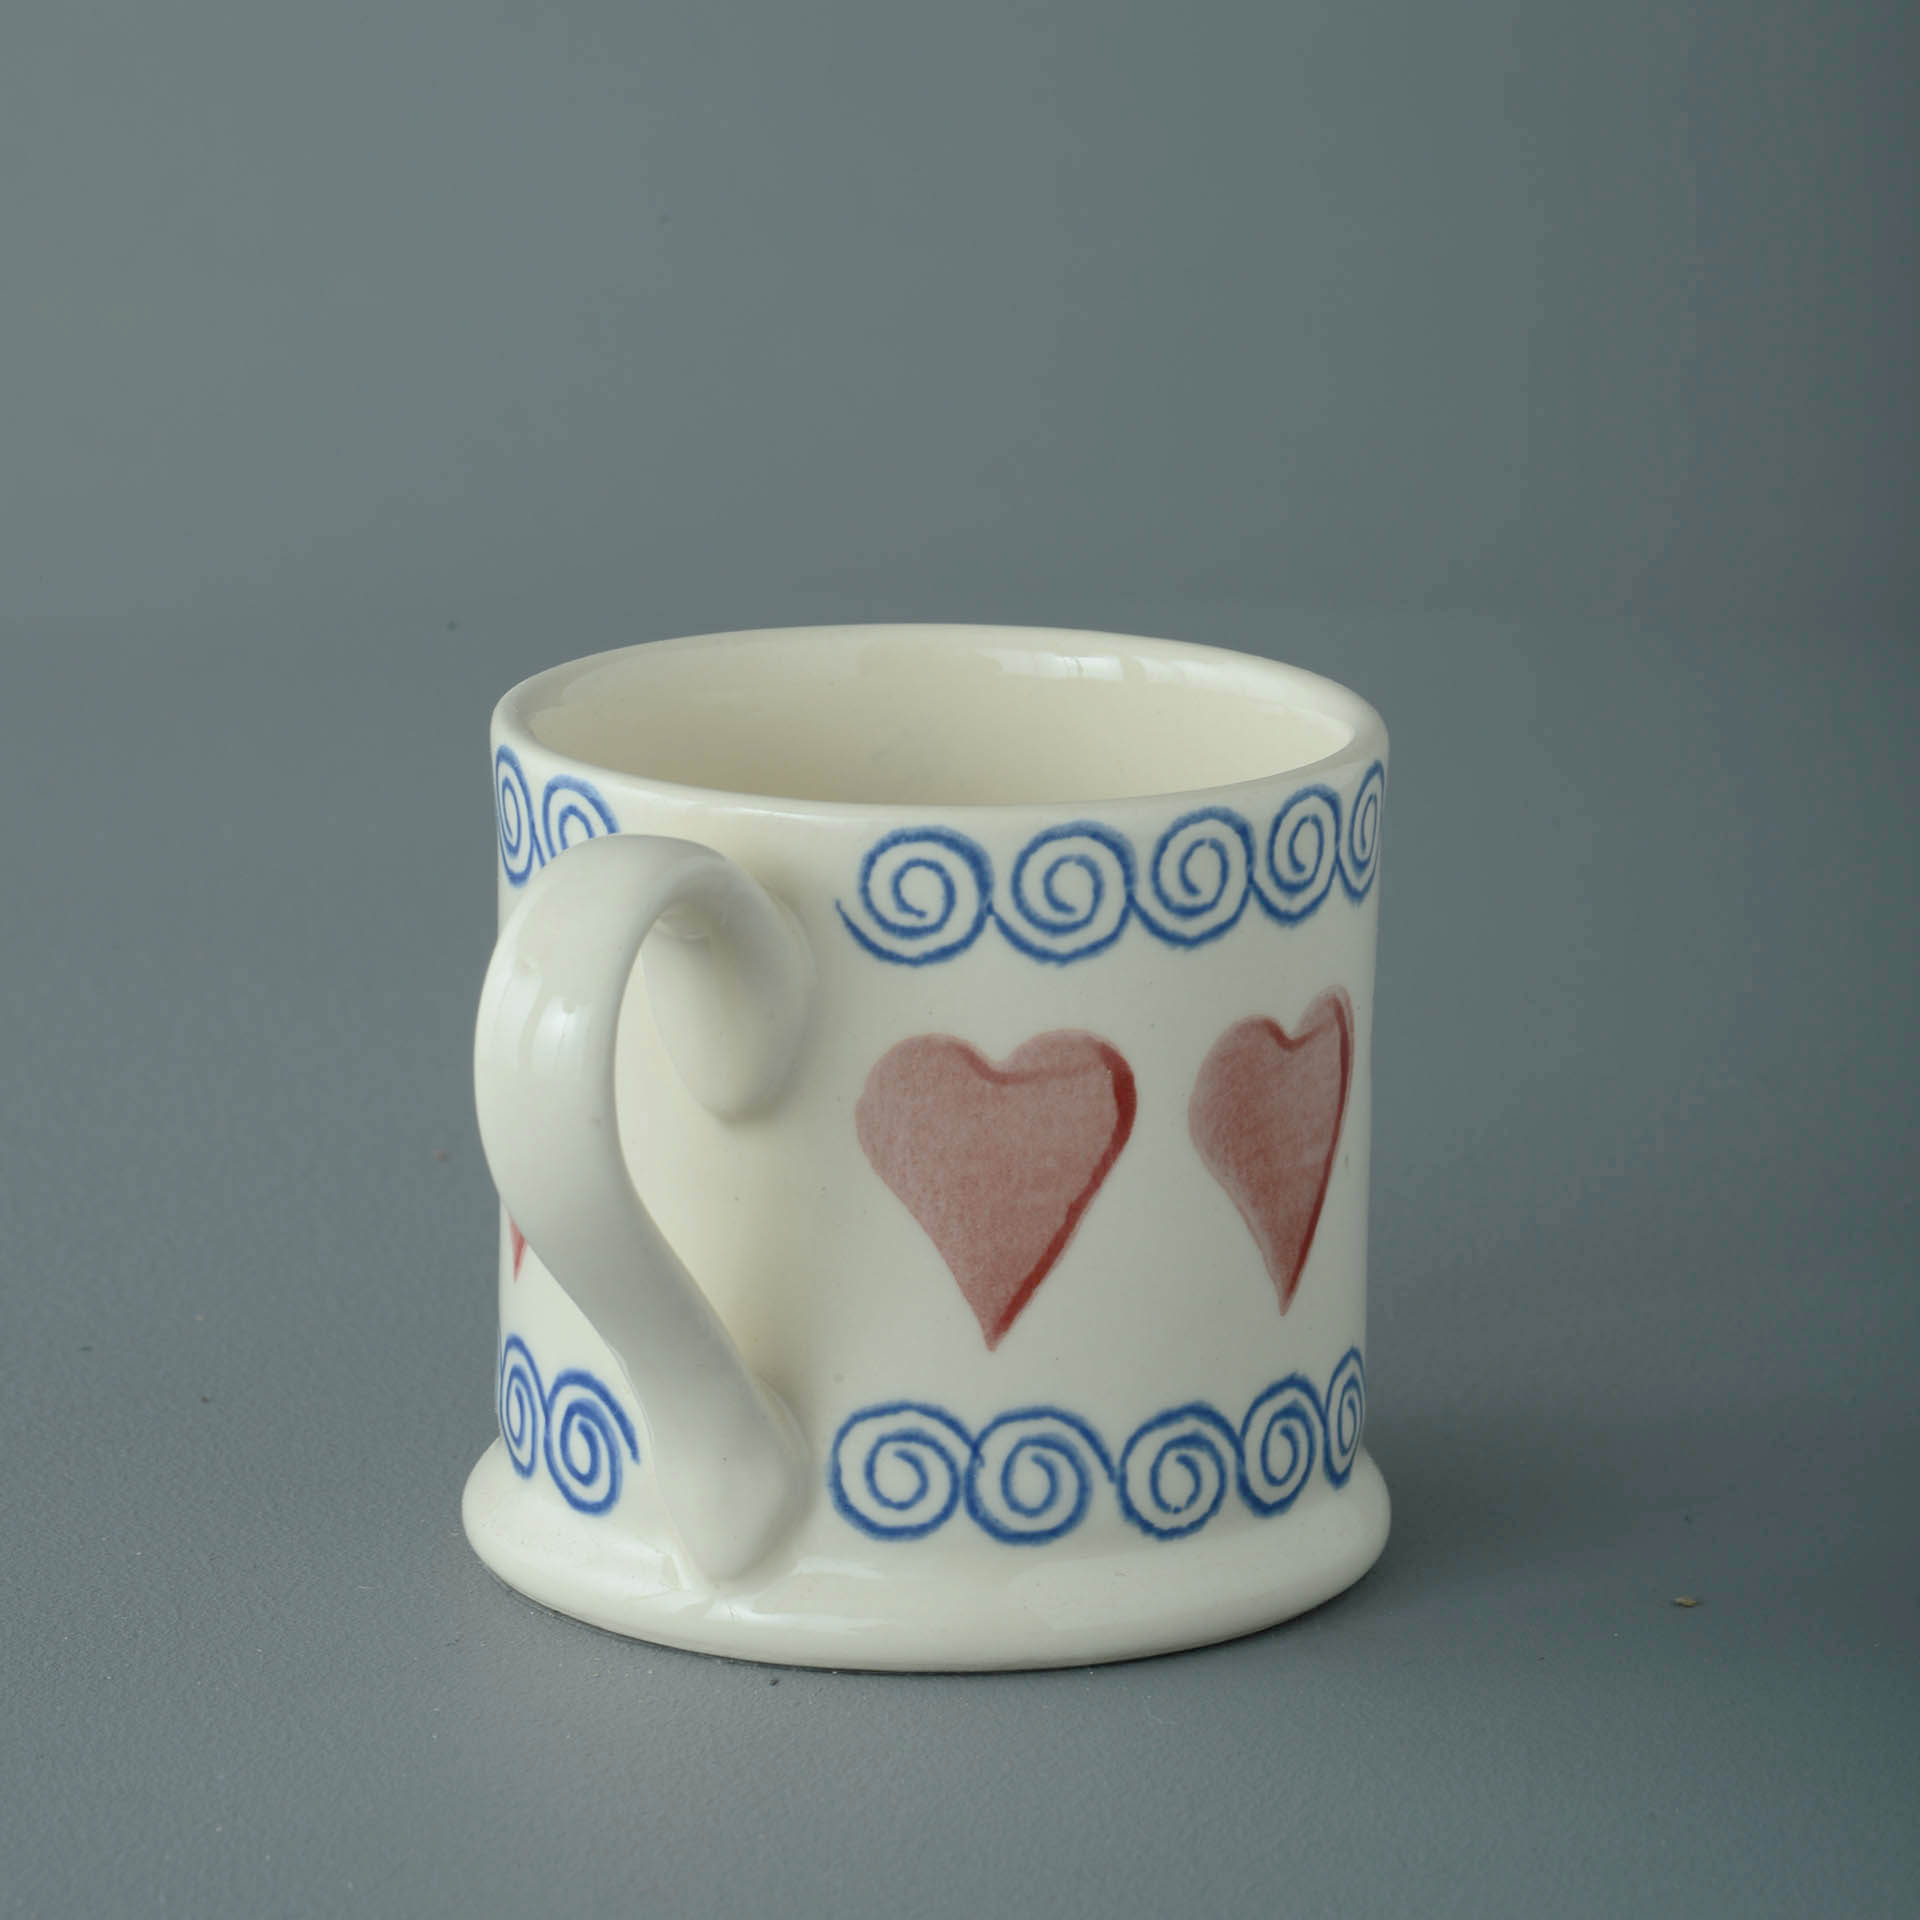 Hearts 150ml Small Mug 7 x 7.3cm